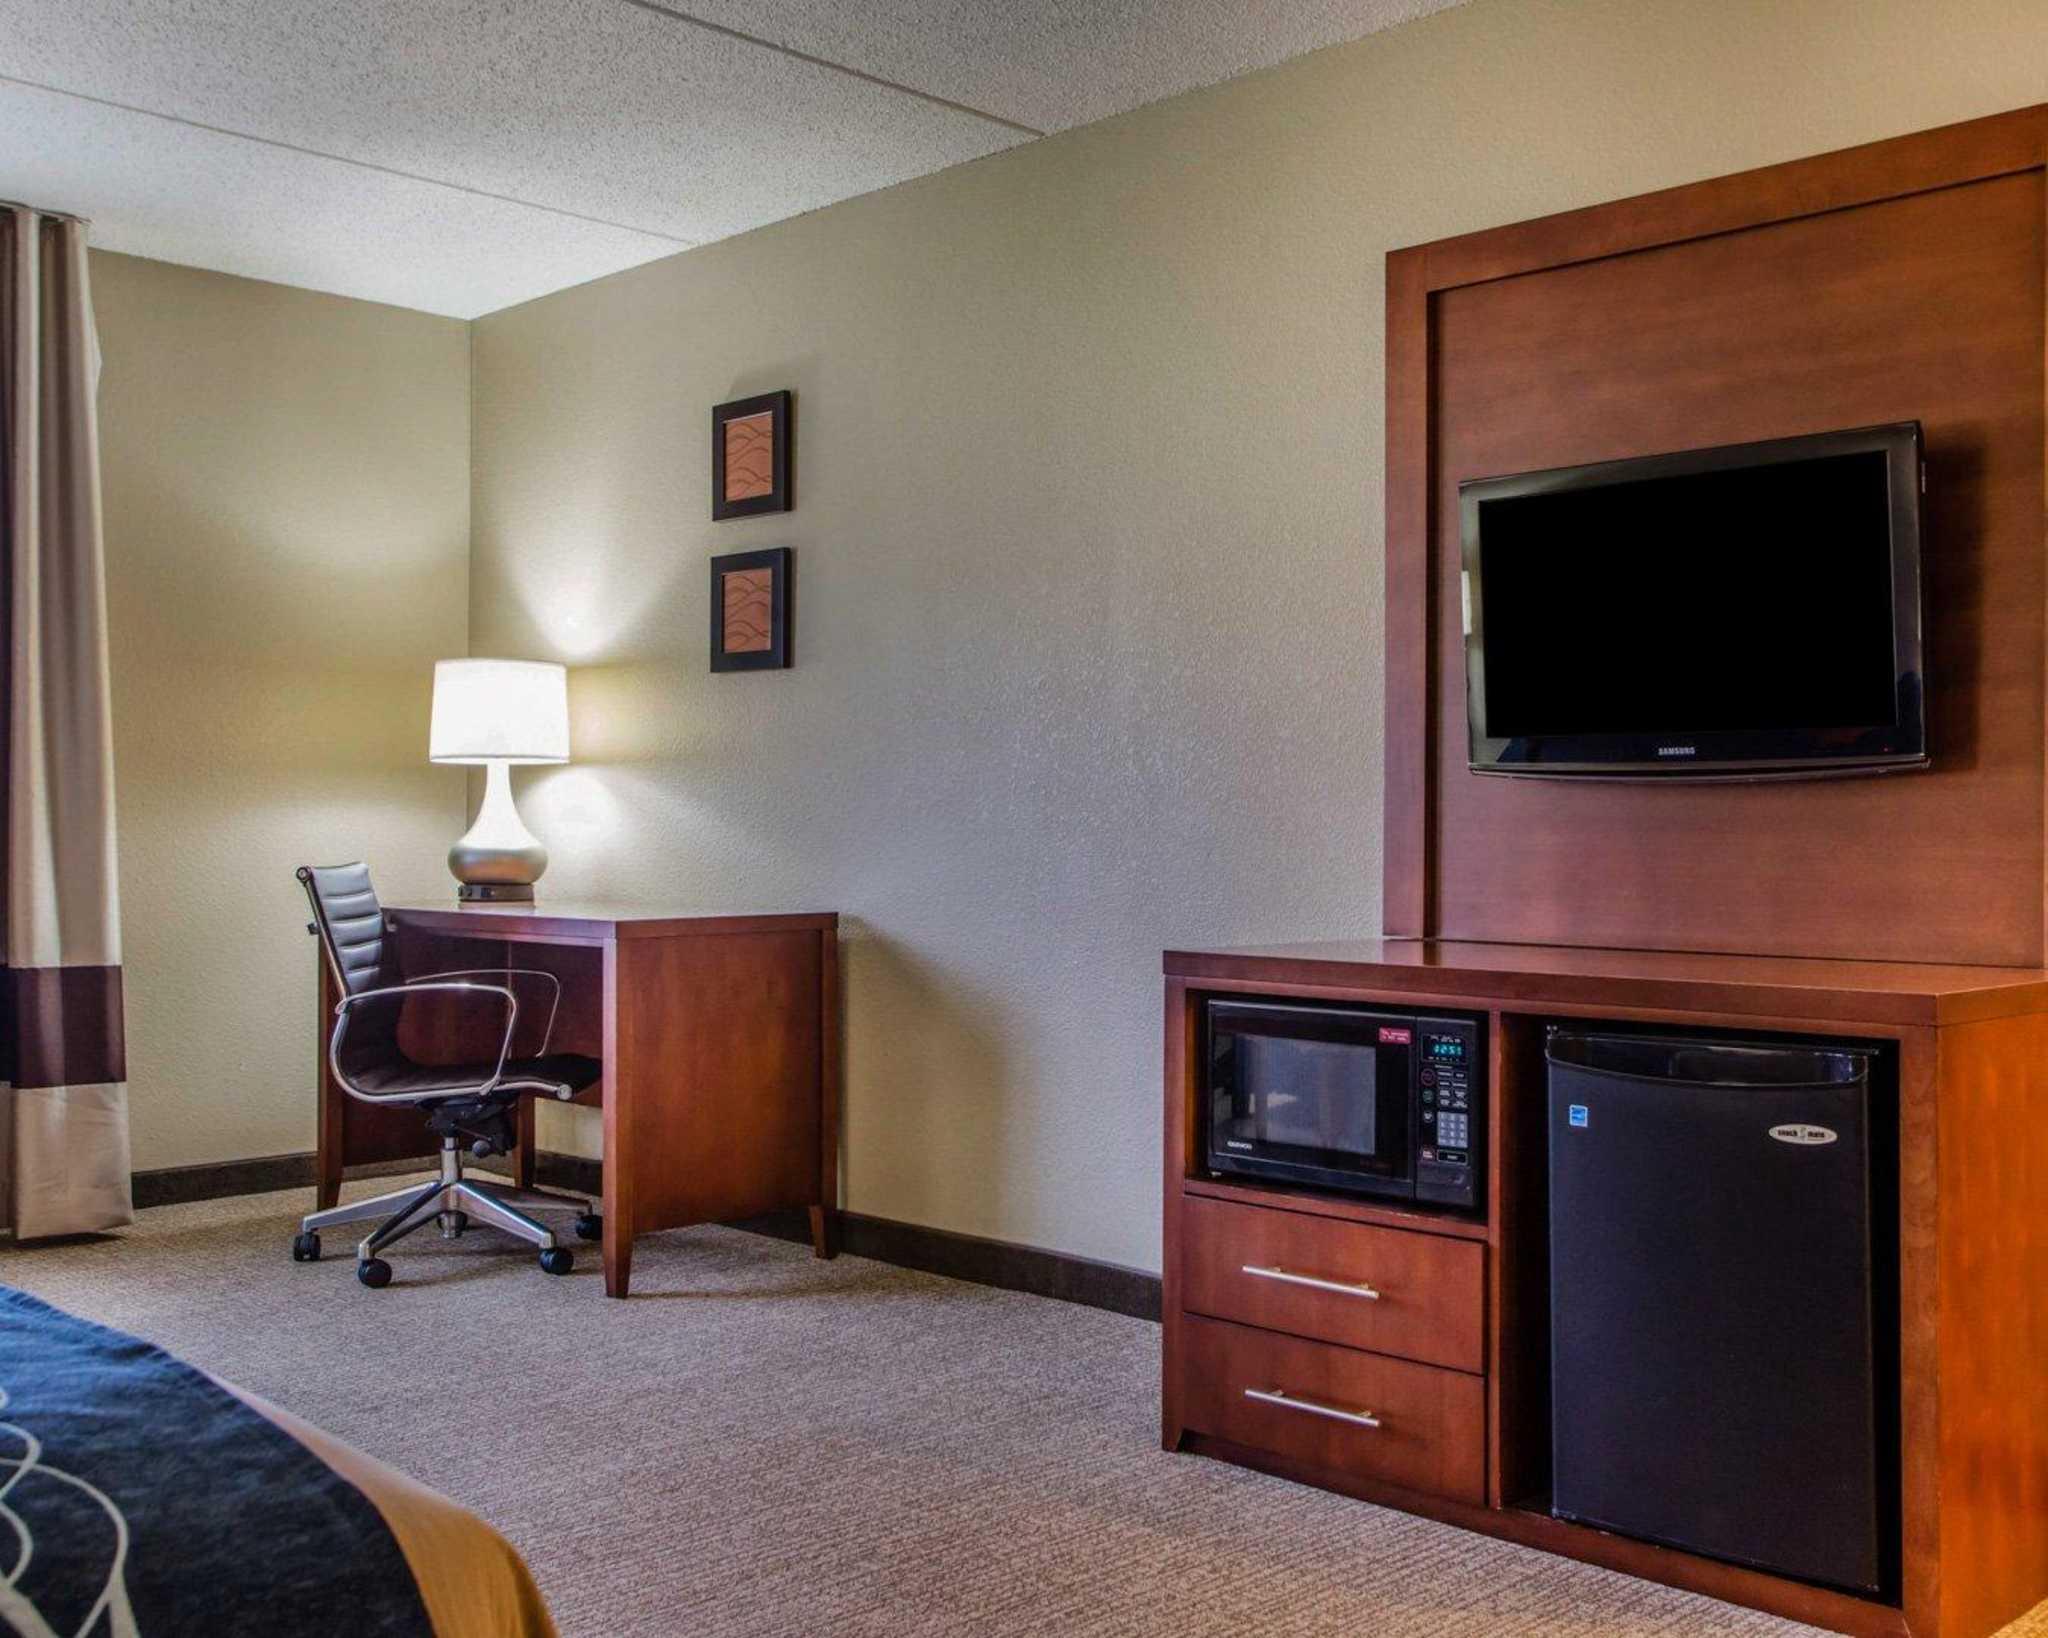 Comfort Inn & Suites Jackson - West Bend image 5